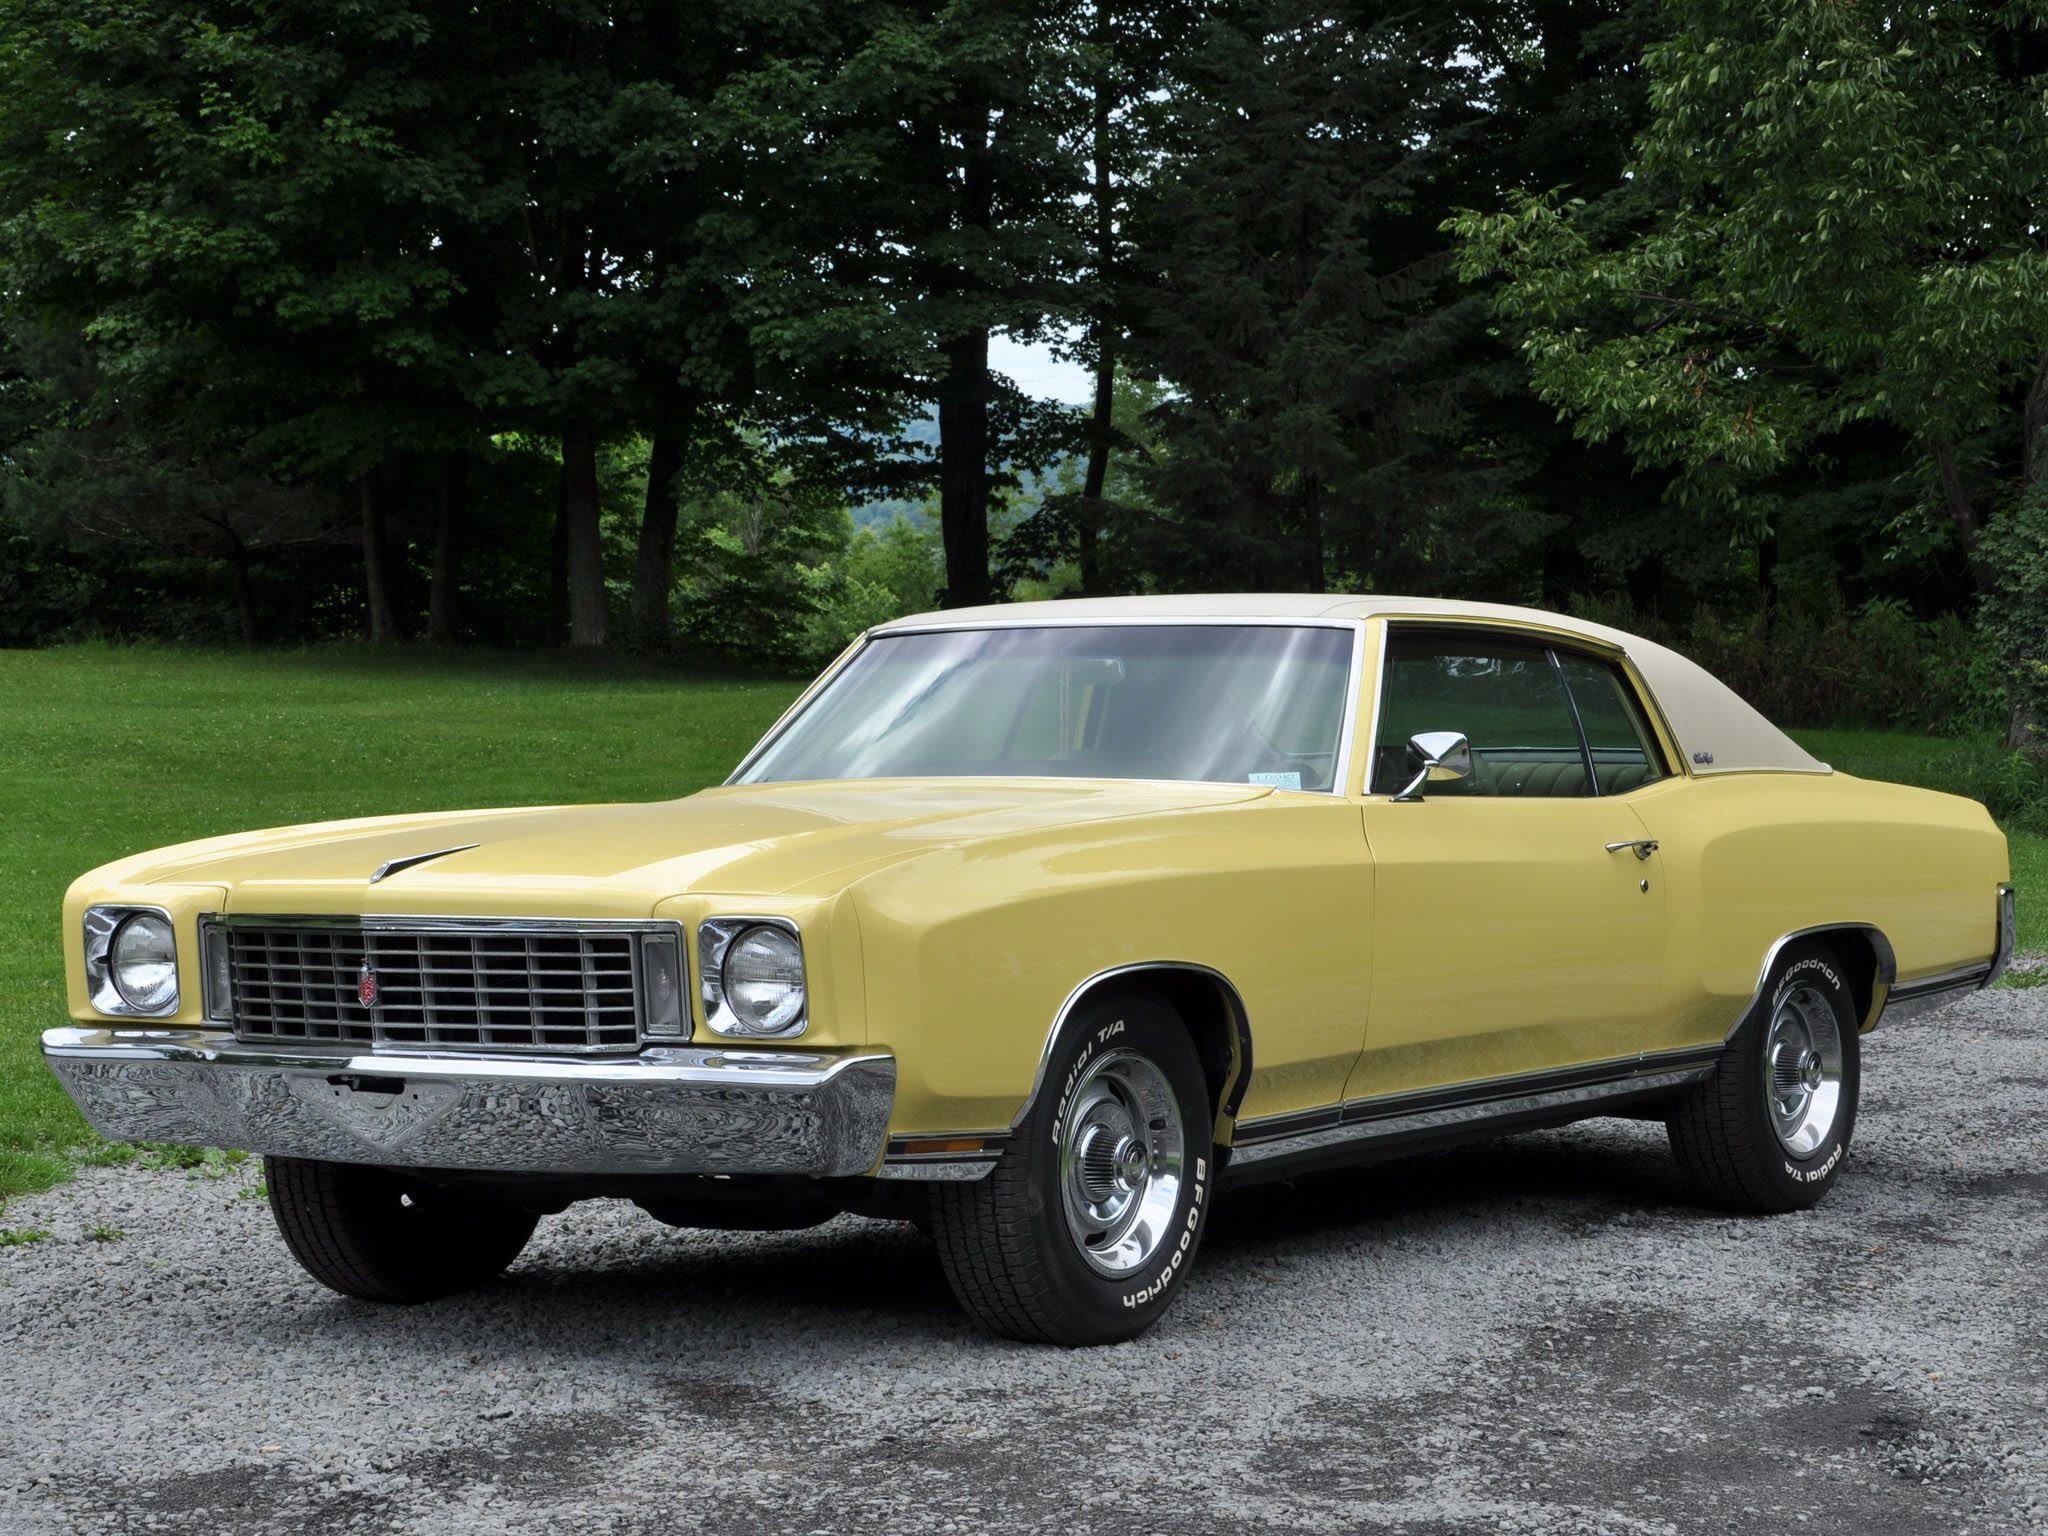 1972 chevrolet monte carlo yellow exterior white top